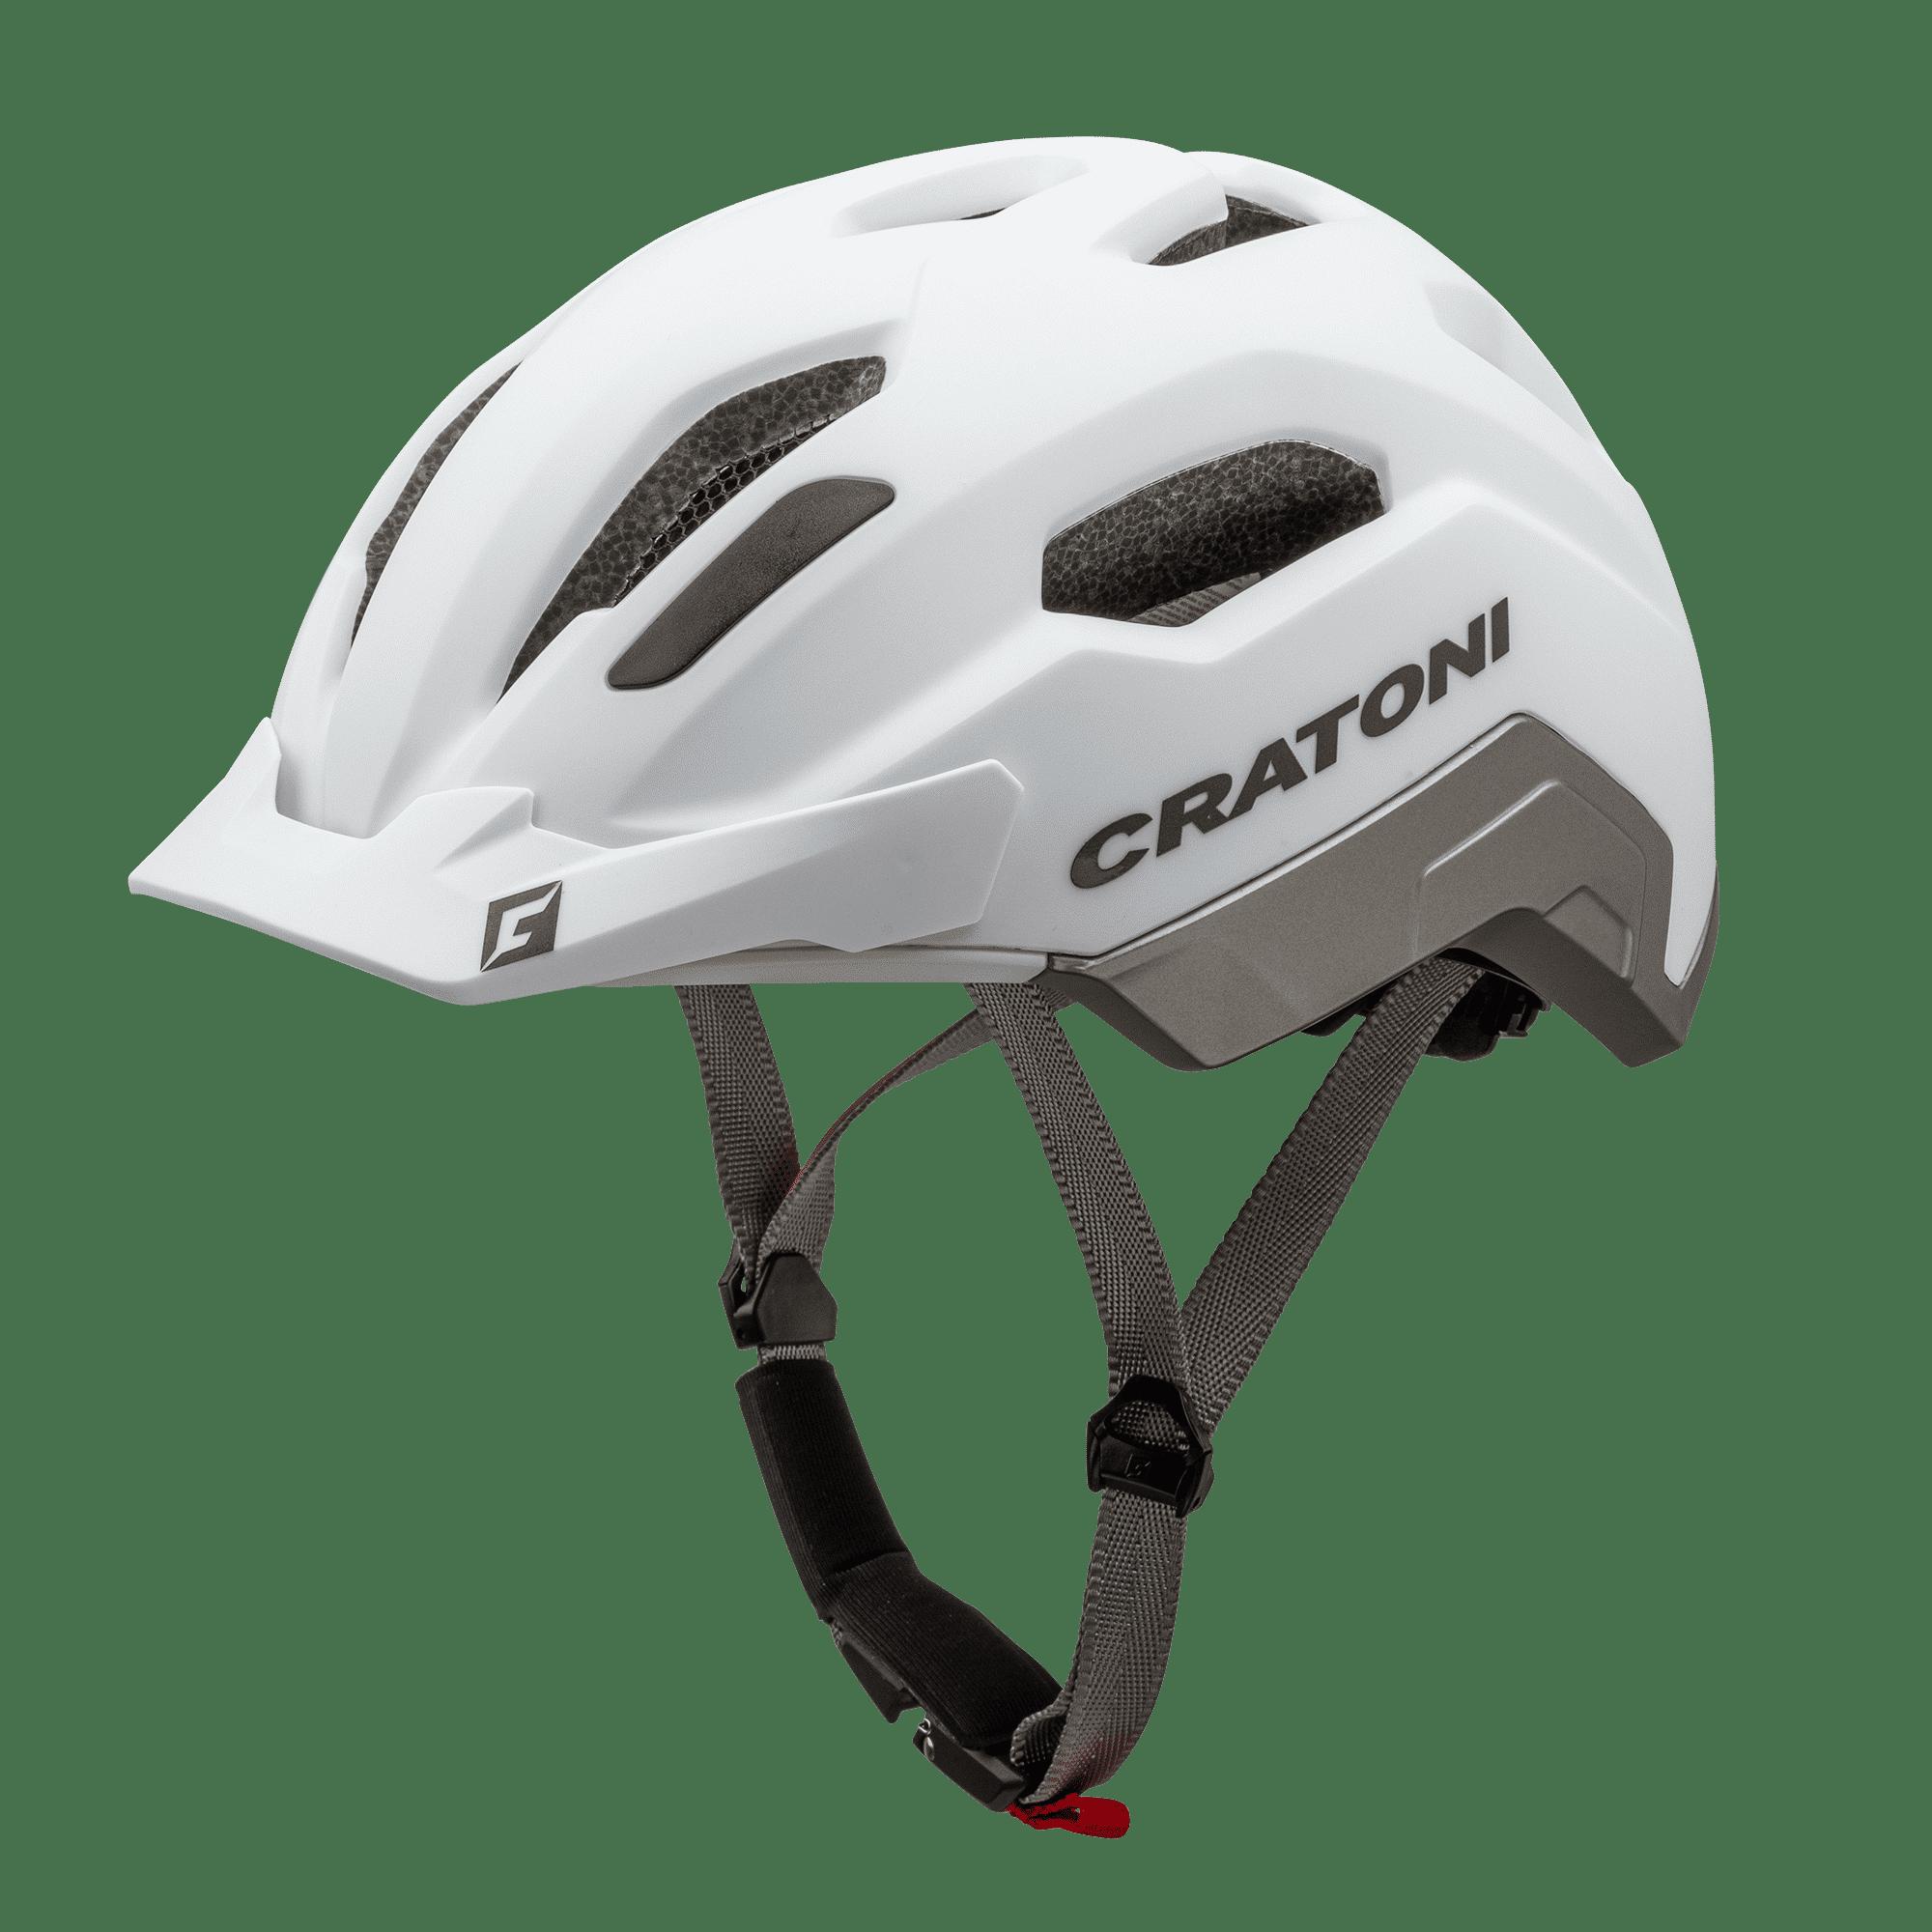 C-Classic White-Anthracite Matt